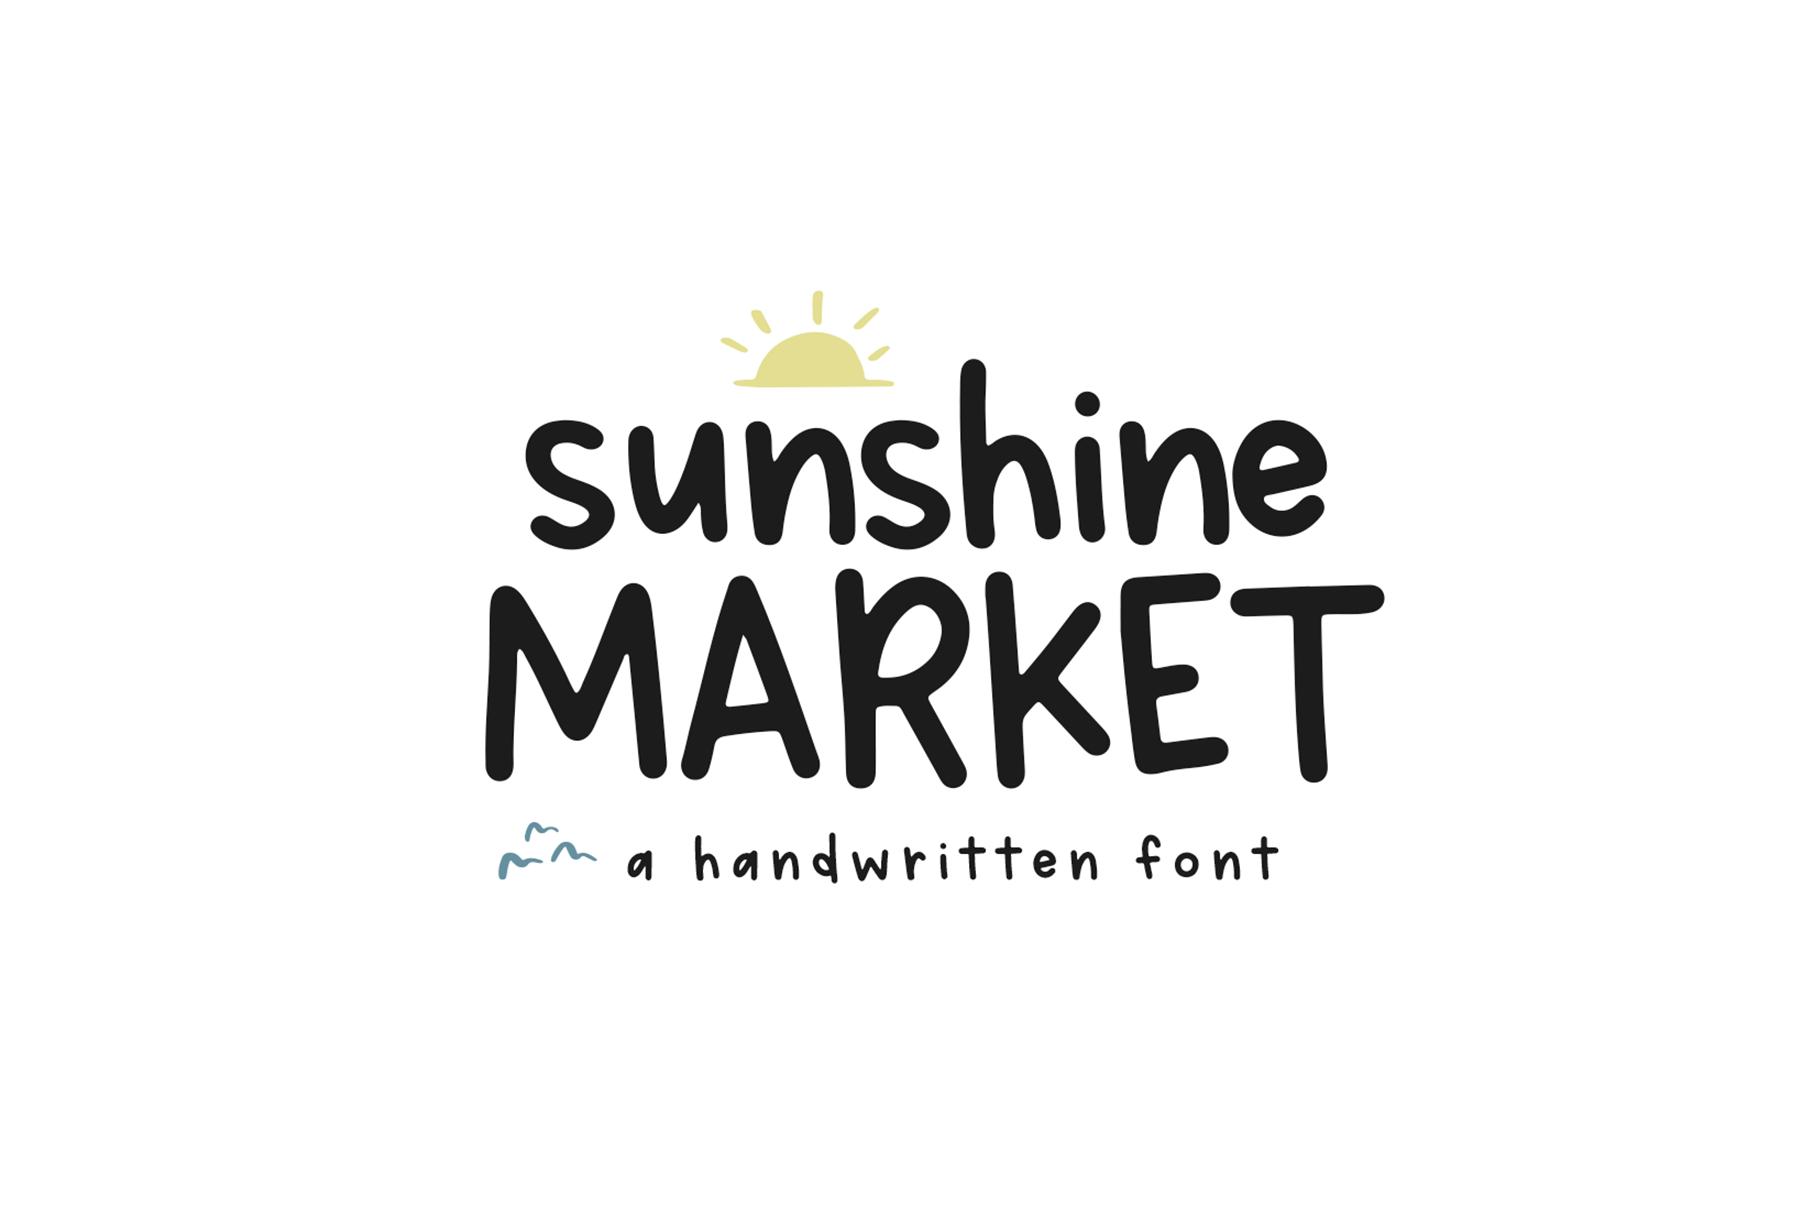 Sunshine Market - A Handwritten Font example image 1